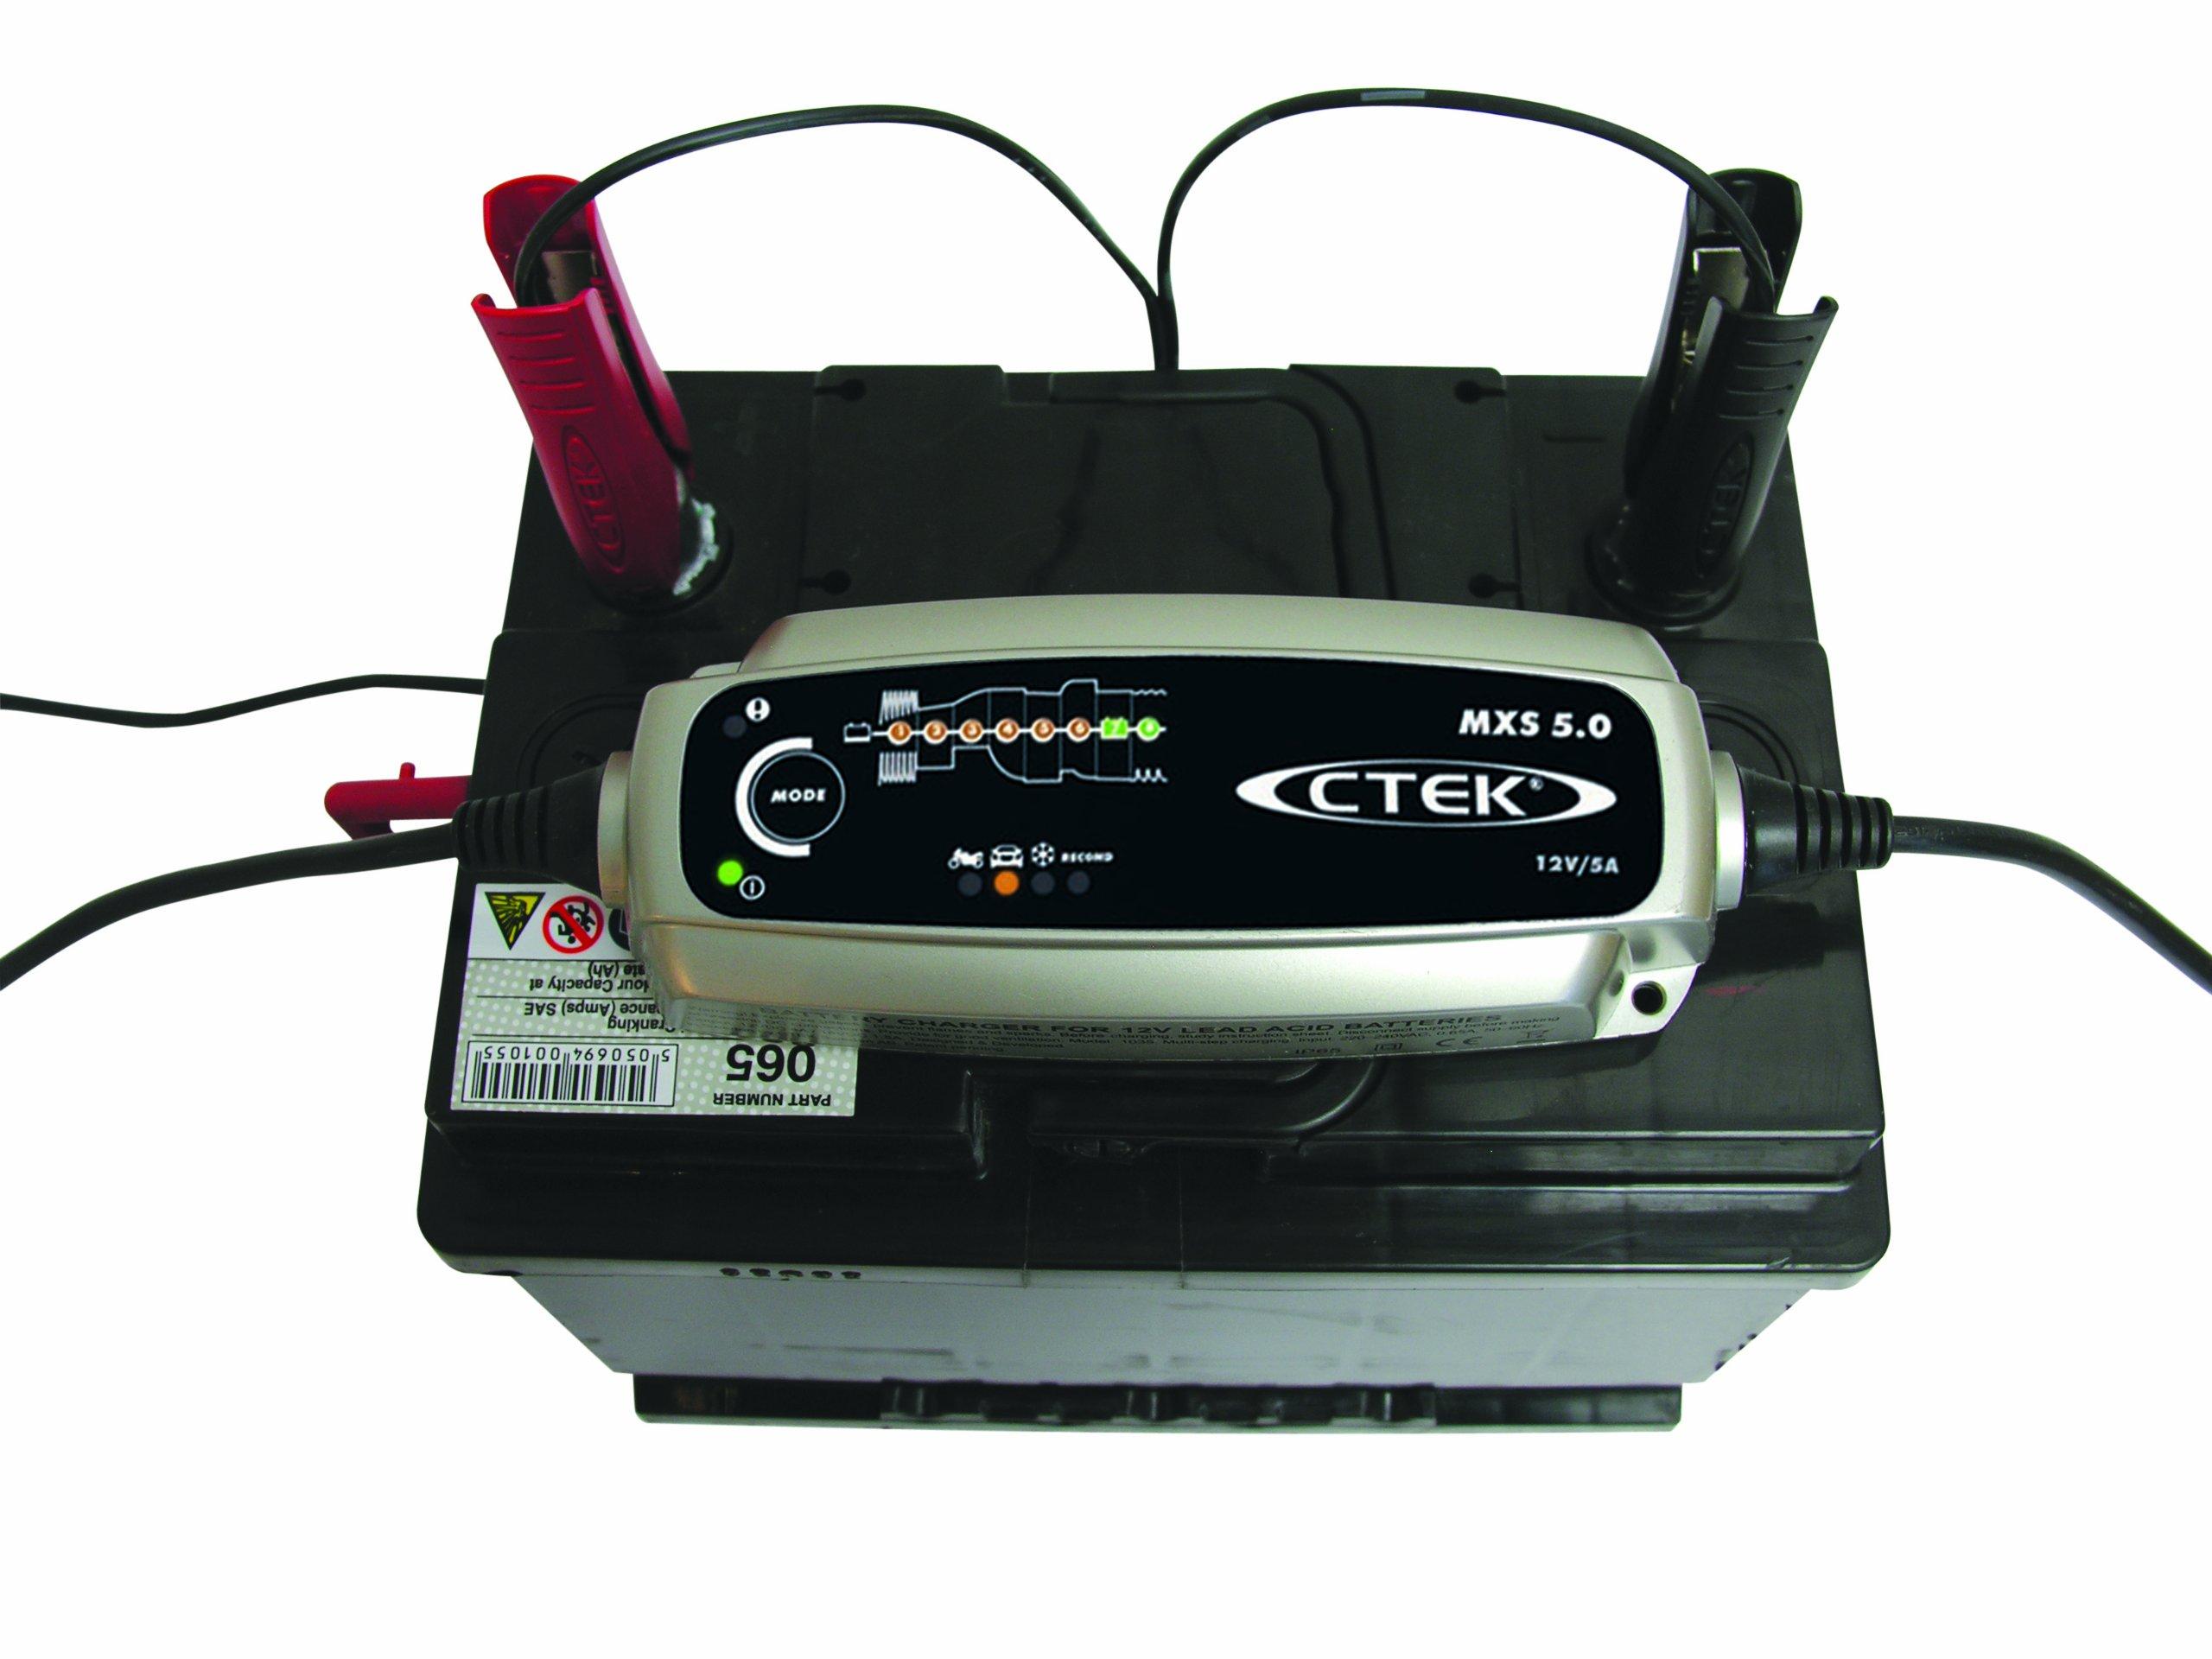 CTEK MXS 5.0 Caricabatteria 12V-5A (Senza compensazione automatica di temperatura) (Cessata produzione da parte del produttore)